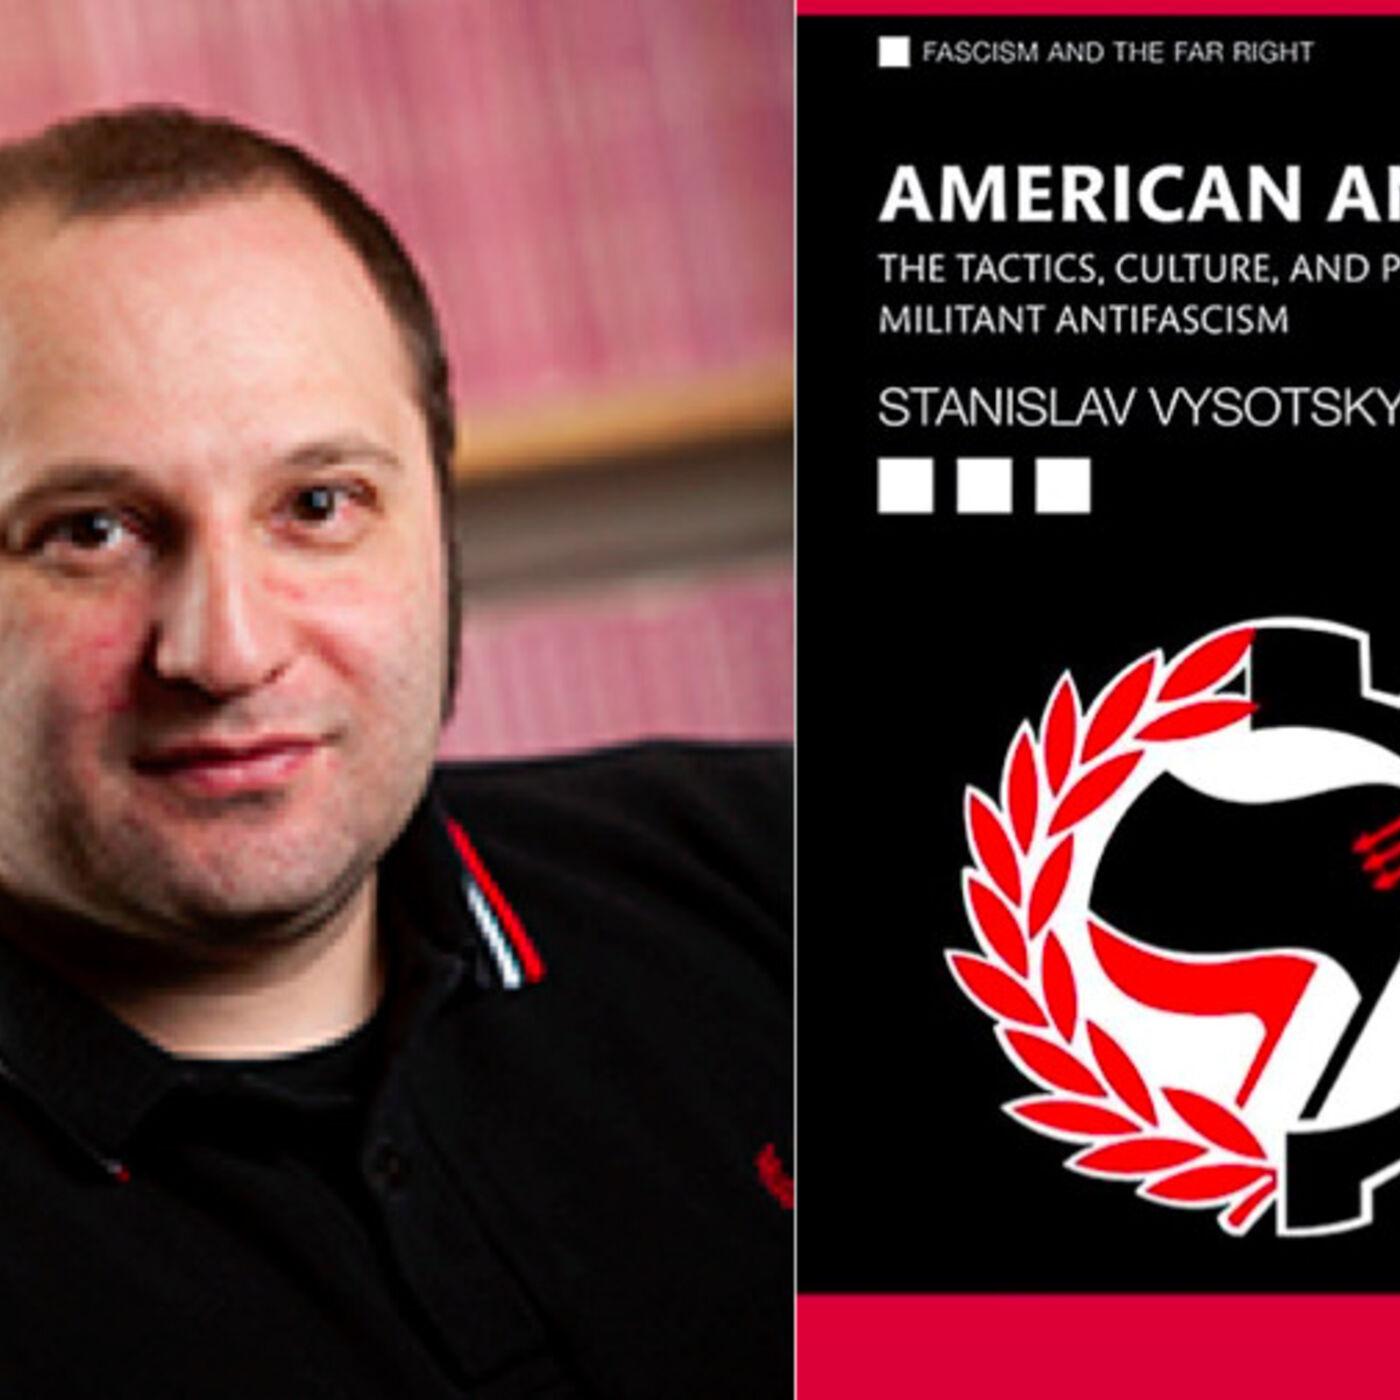 27. Stanislav Vysotsky on American Antifa